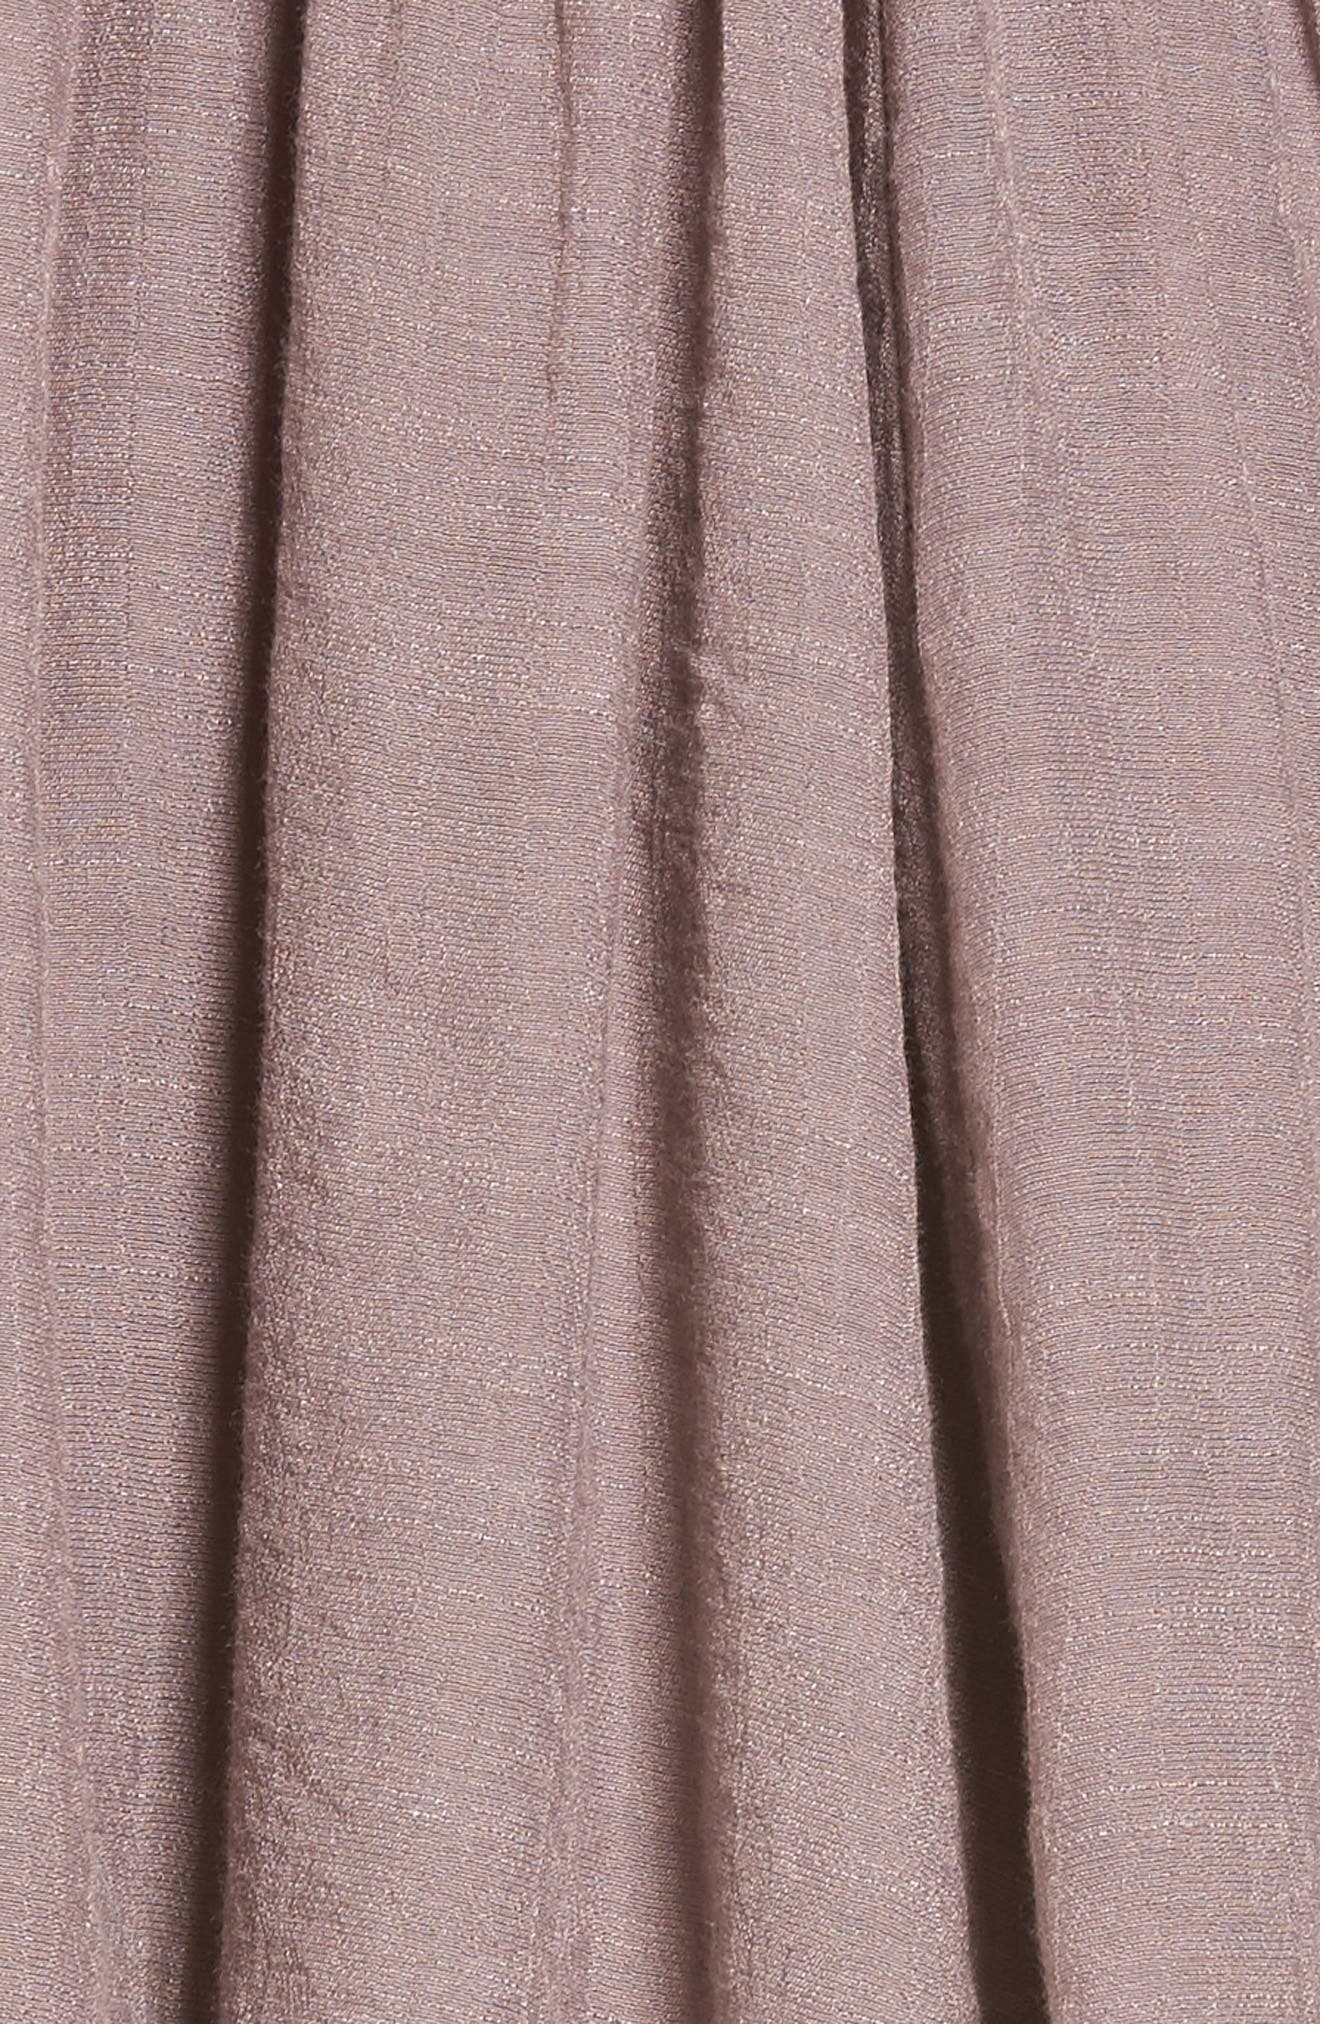 Lace-Up Peasant Dress,                             Alternate thumbnail 5, color,                             530